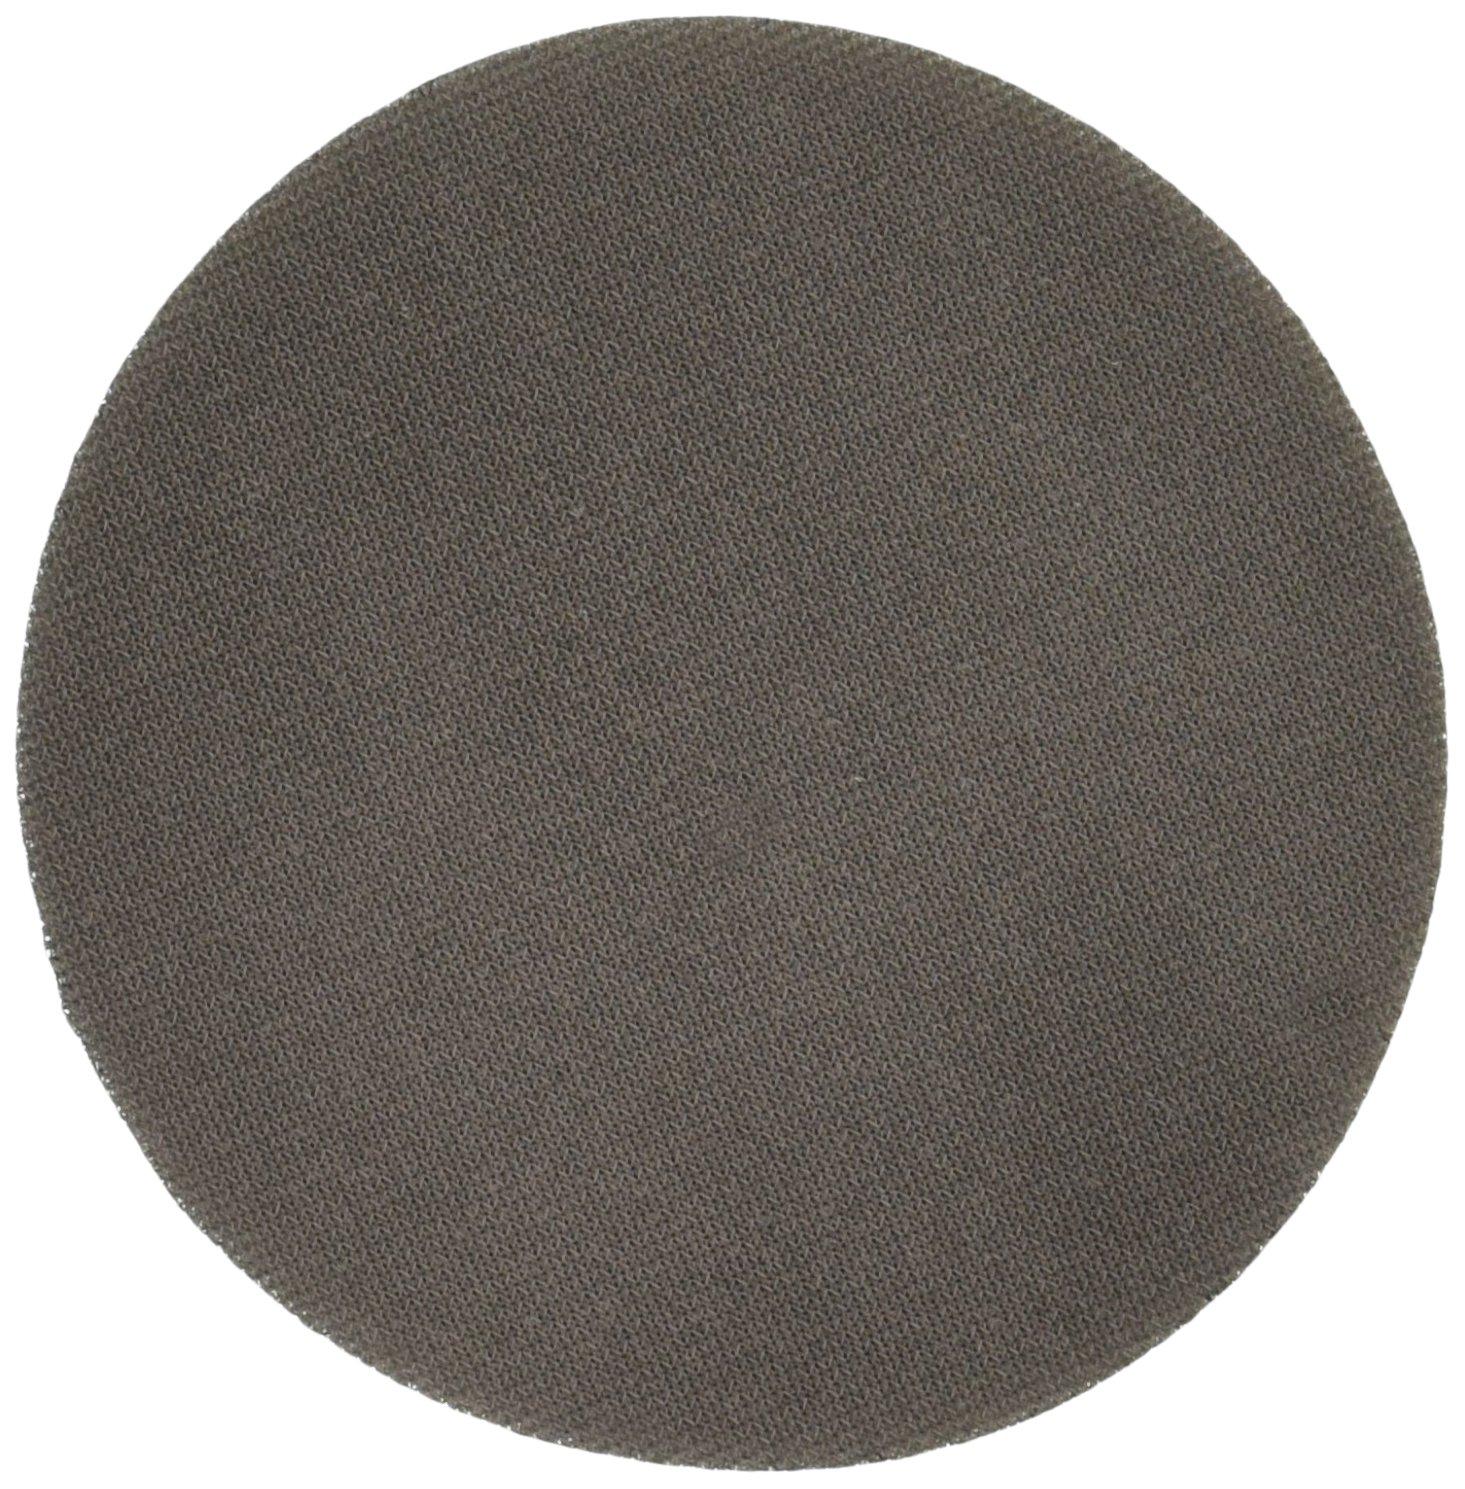 MIRKA Abralon 3 Inch 1000 Grit Sanding Discs 20 per box